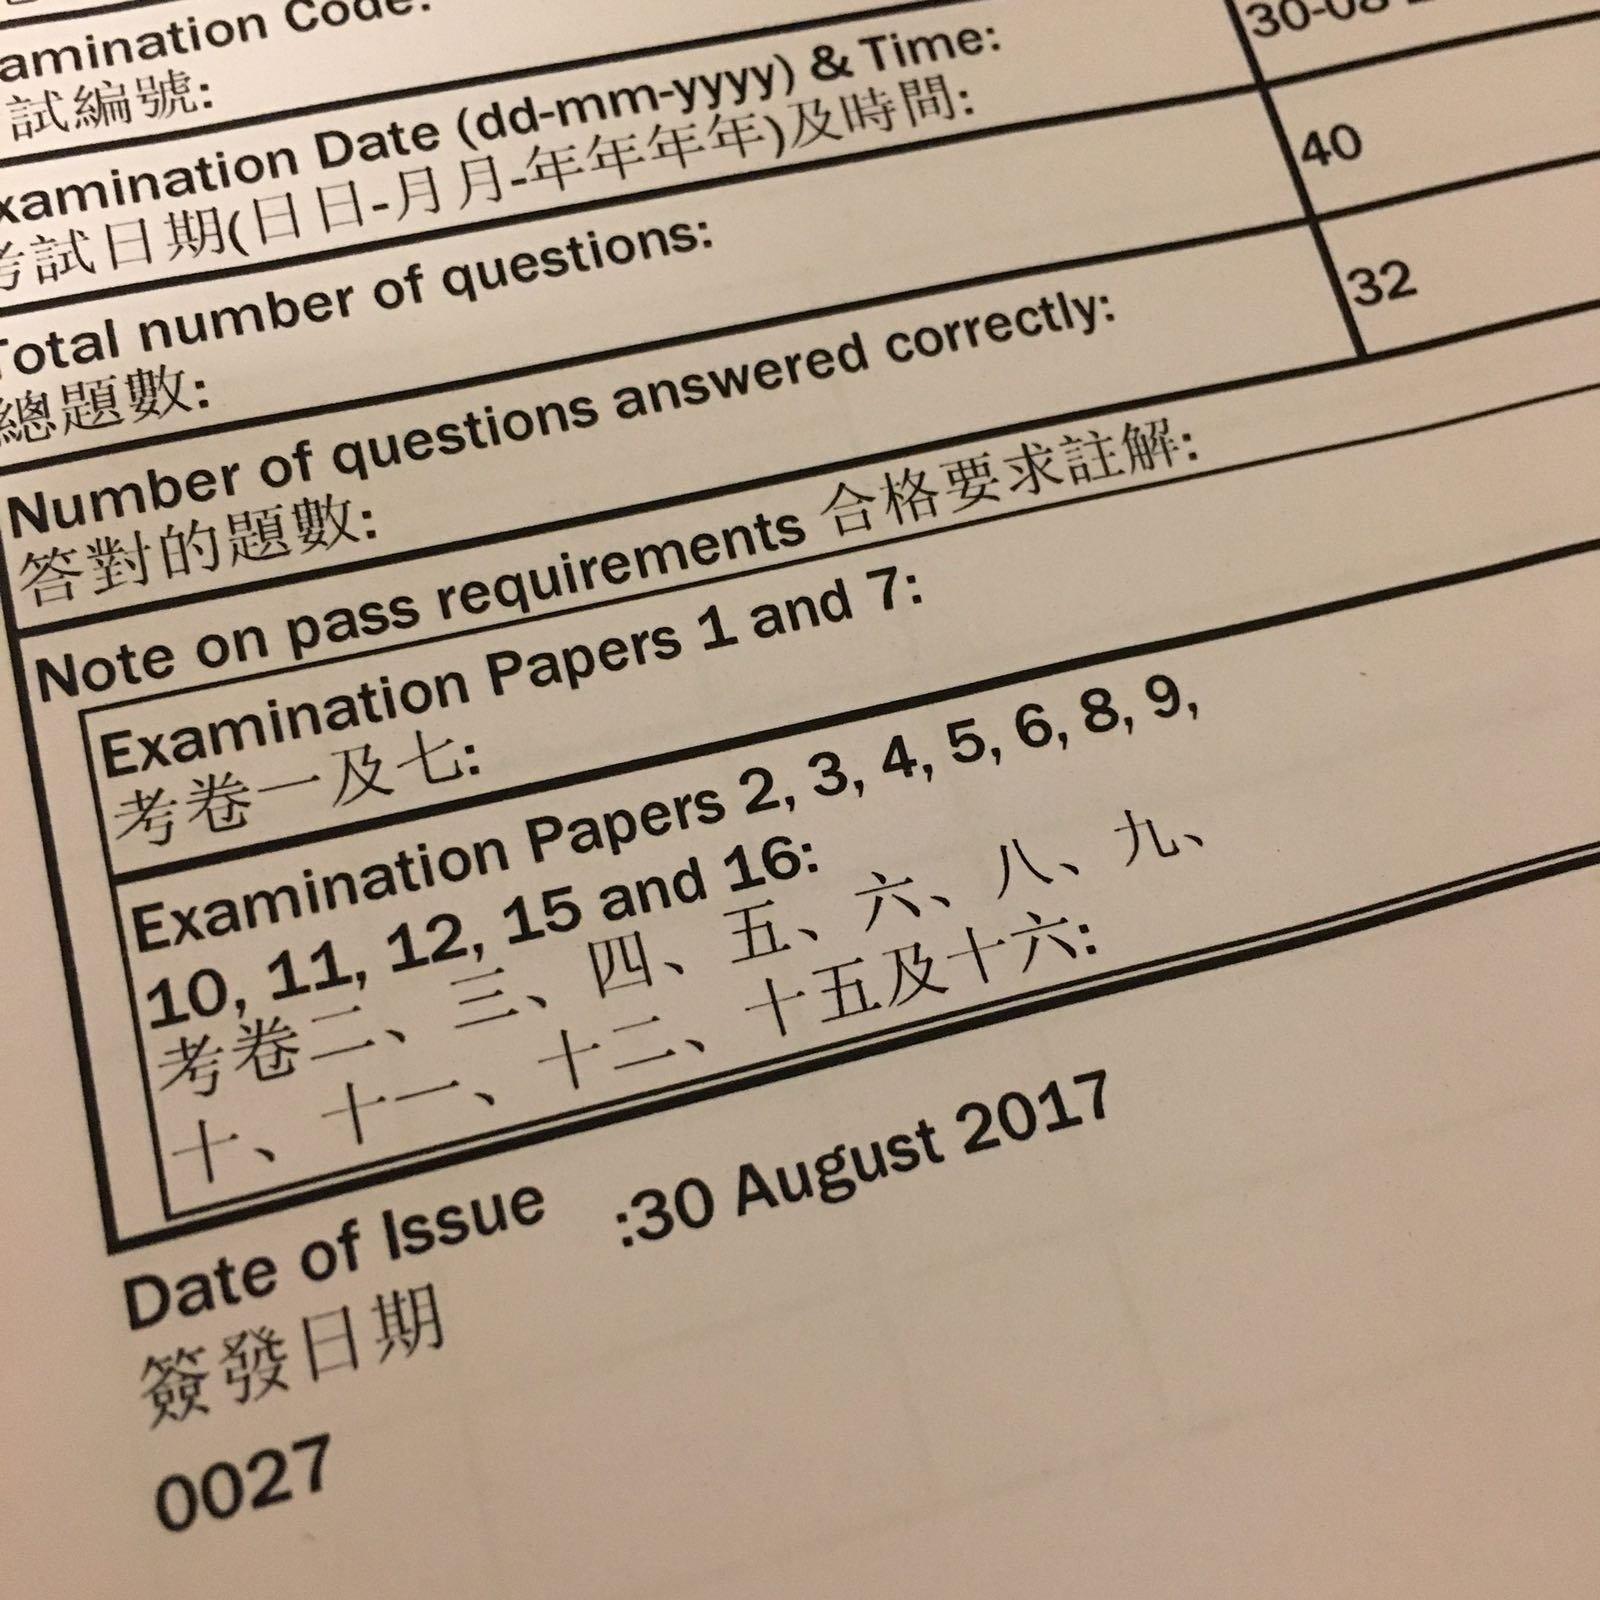 YYK 30/8/2017 LE Paper 12 證券期貨從業員資格考試卷十二